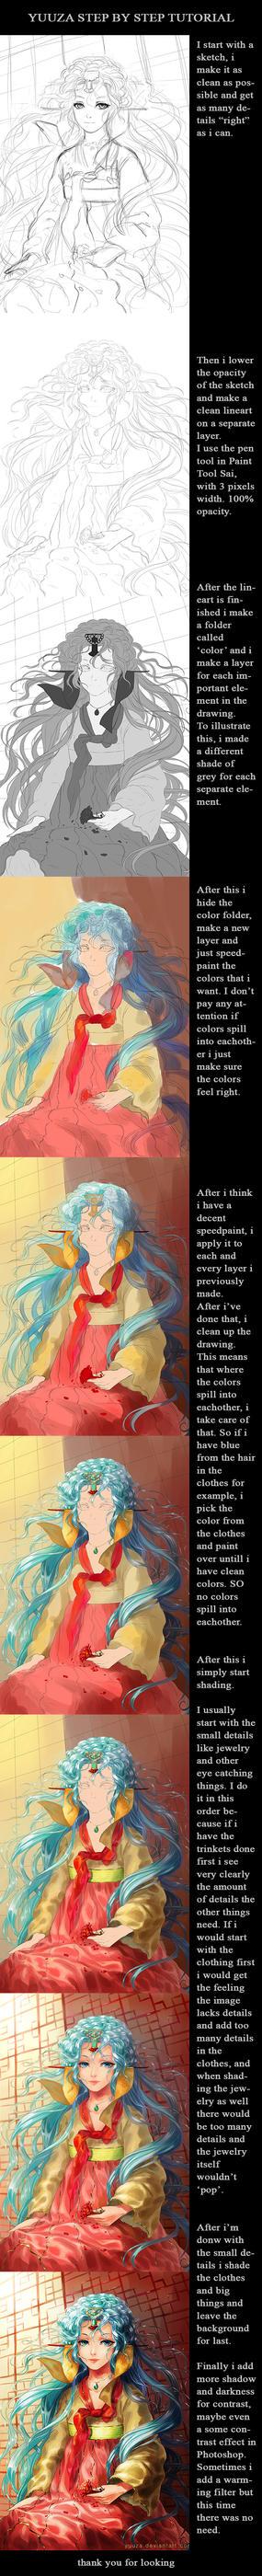 Coloring tutorial by Yuuza